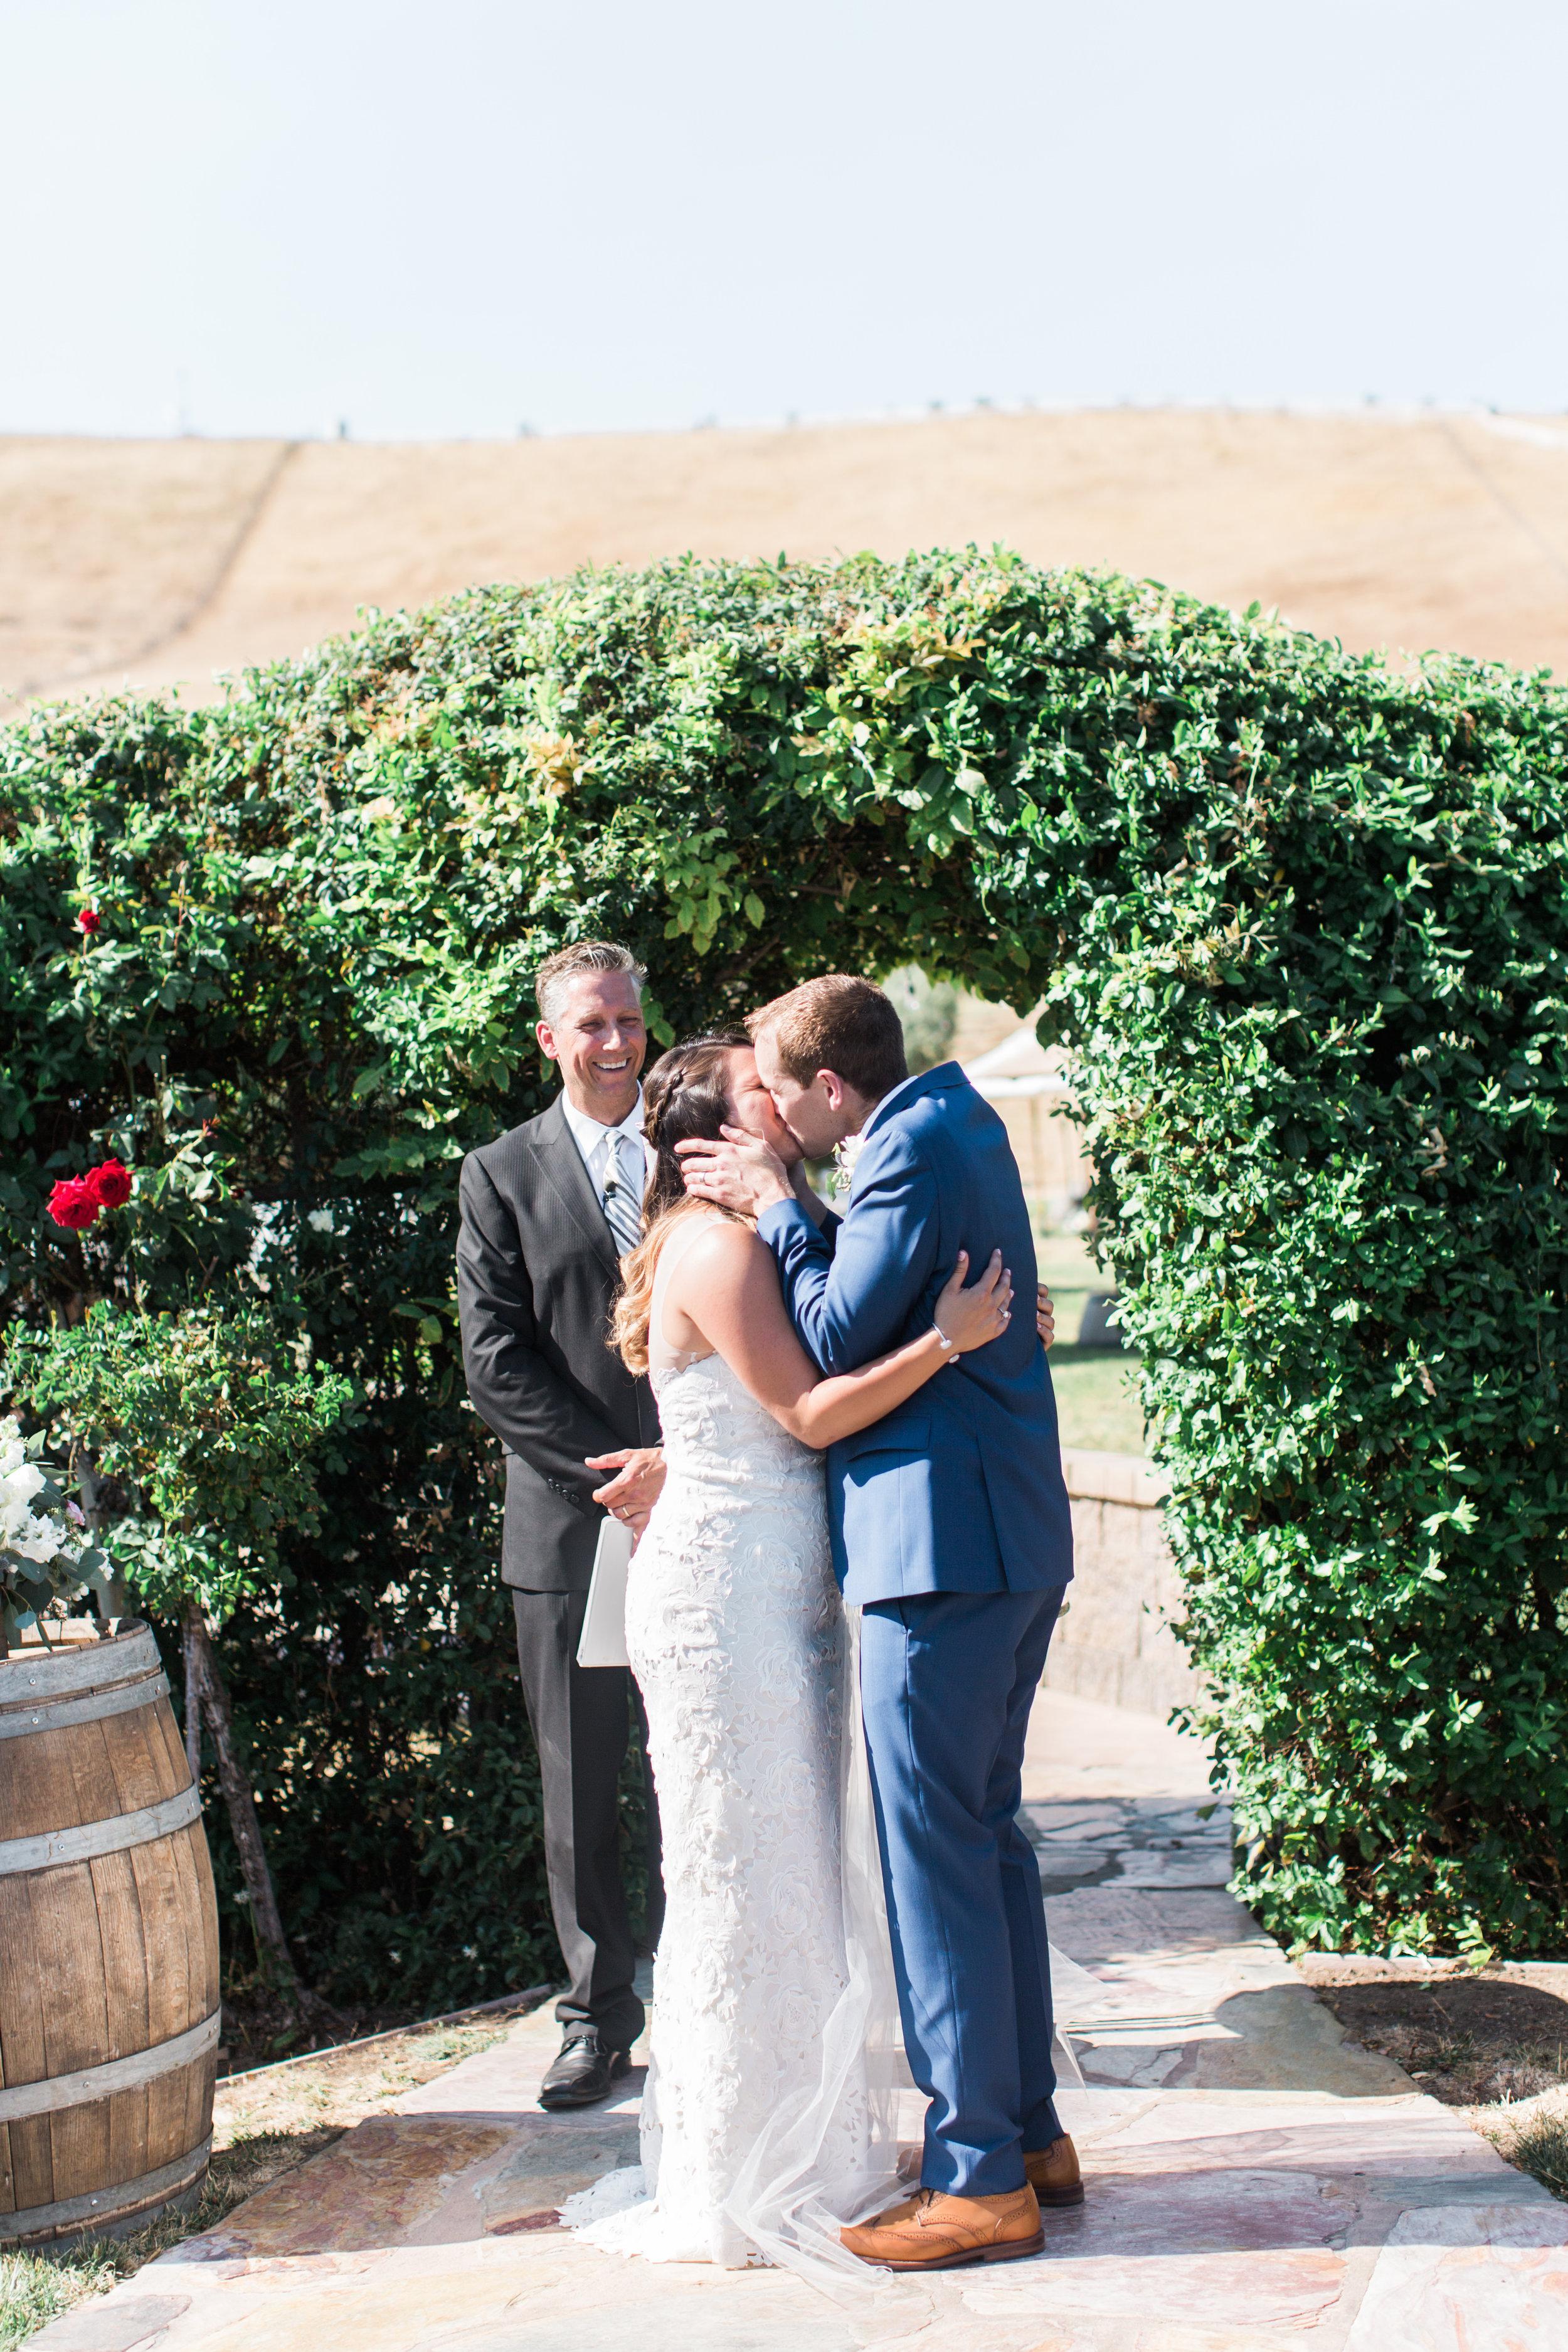 the-purple-orchid-resort-wedding-in-livermore-california-13.jpg